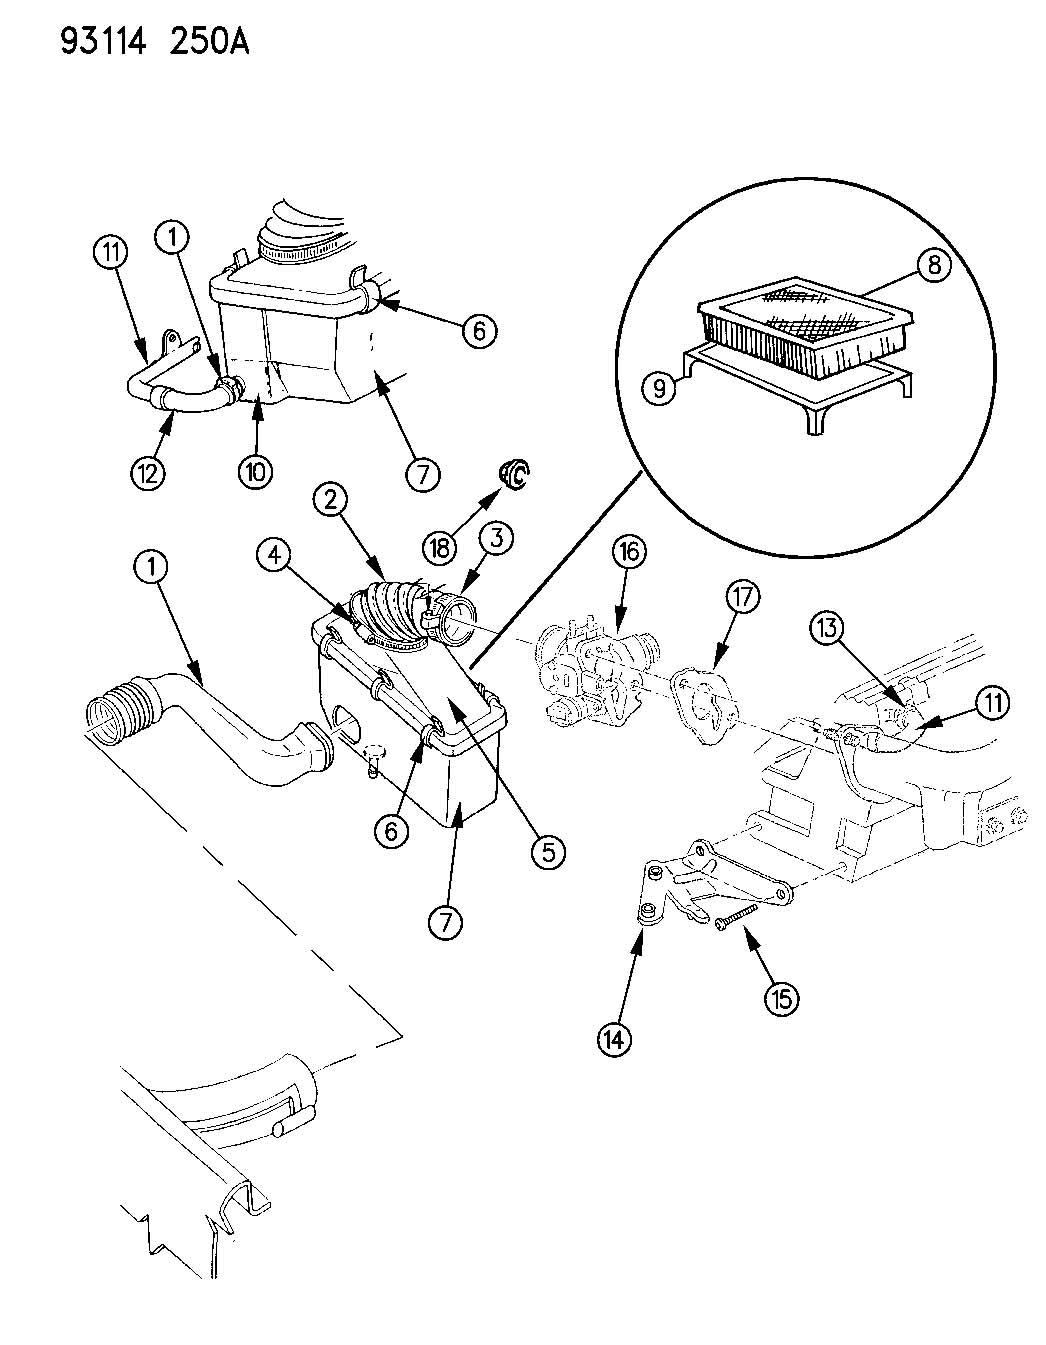 Chrysler Lebaron AIR CLEANER 2.5L ENGINE (FLEX FUEL) A BODY